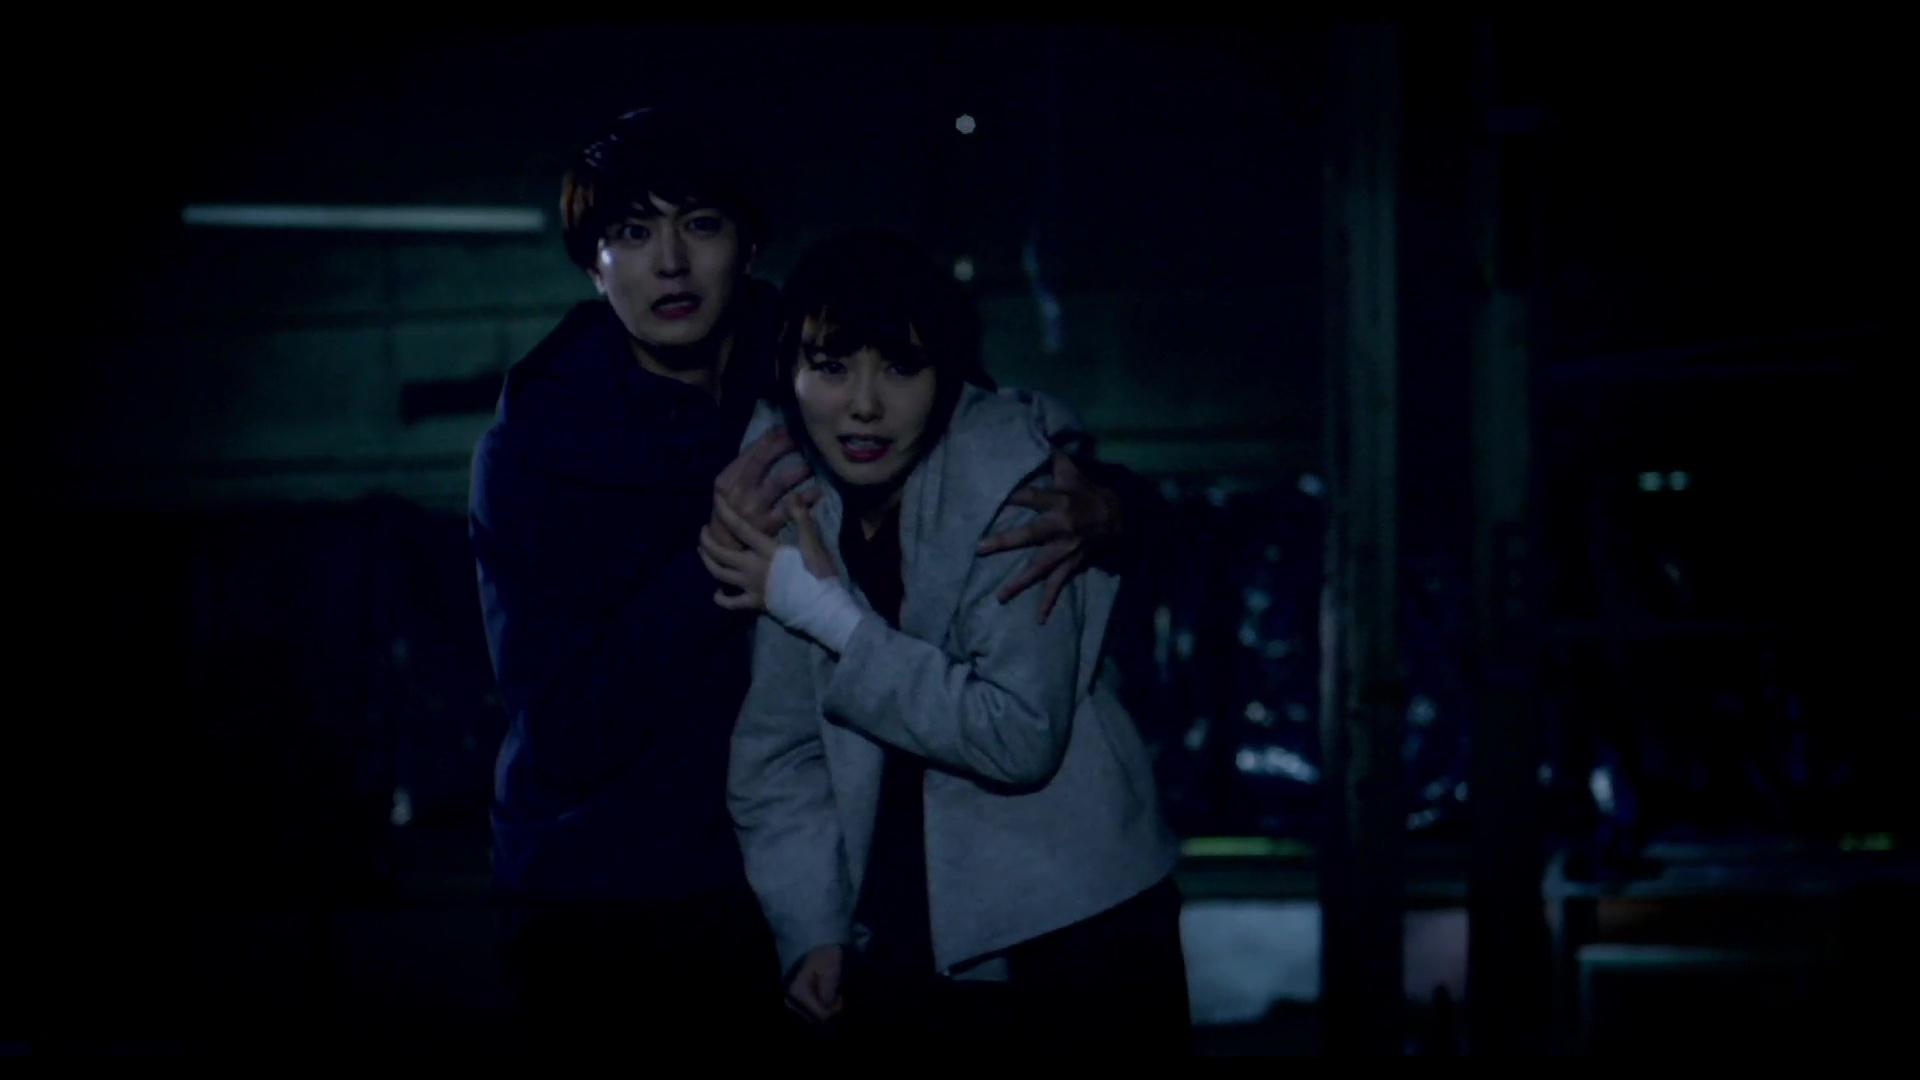 SHIRAI SAN (シライサン) de Adachi Hirotaka (2019)